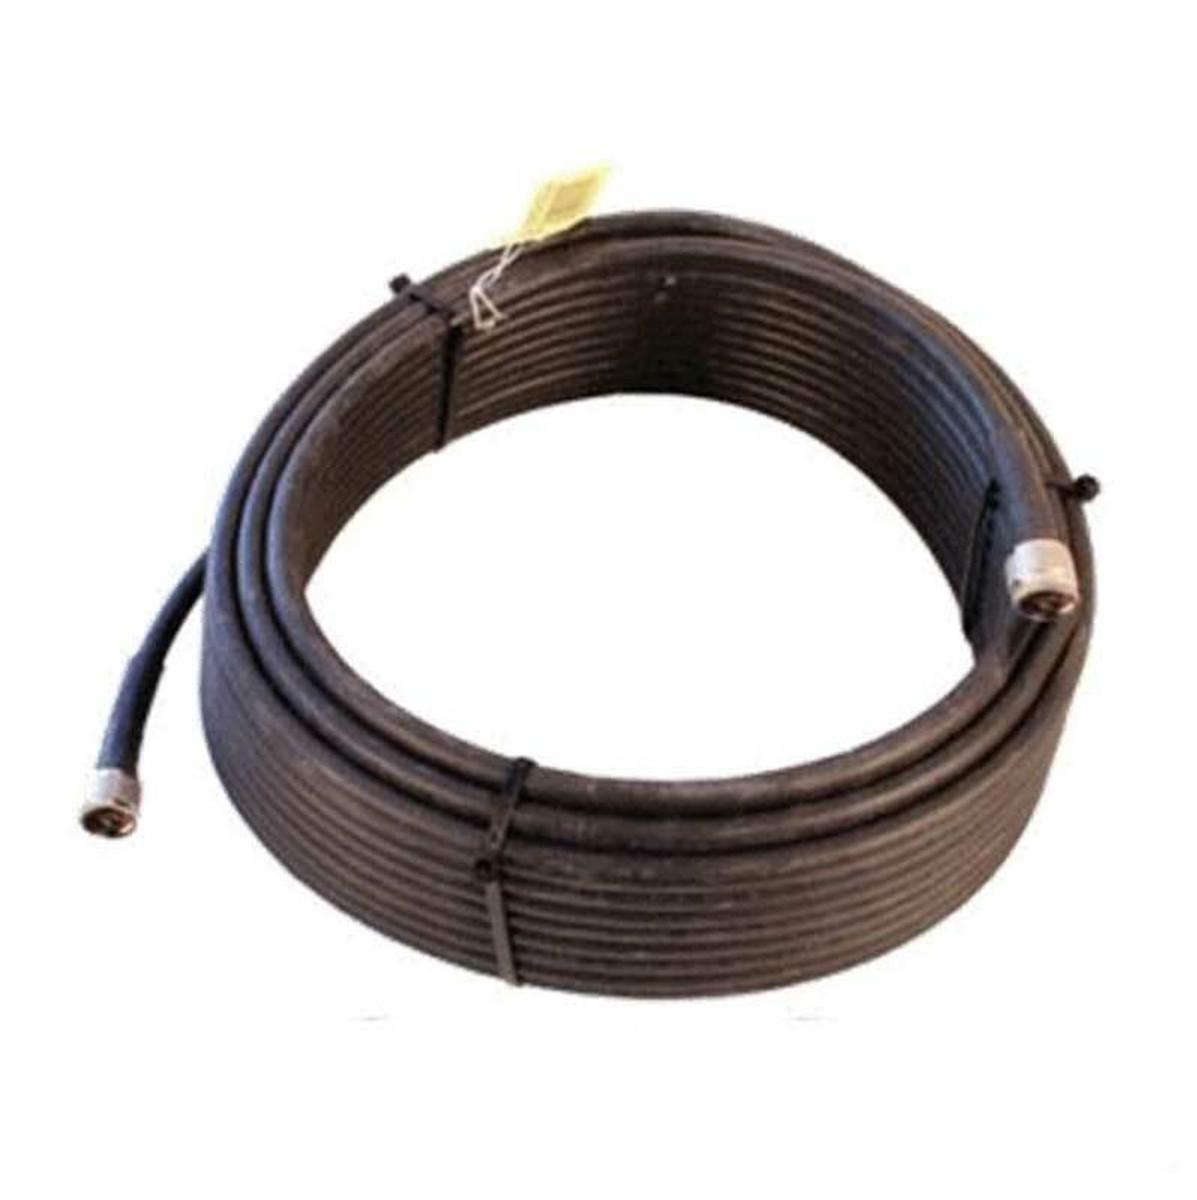 weBoost (Wilson) 952375 Wilson 400 N-Male to N-Male | 75 ft Black Cable